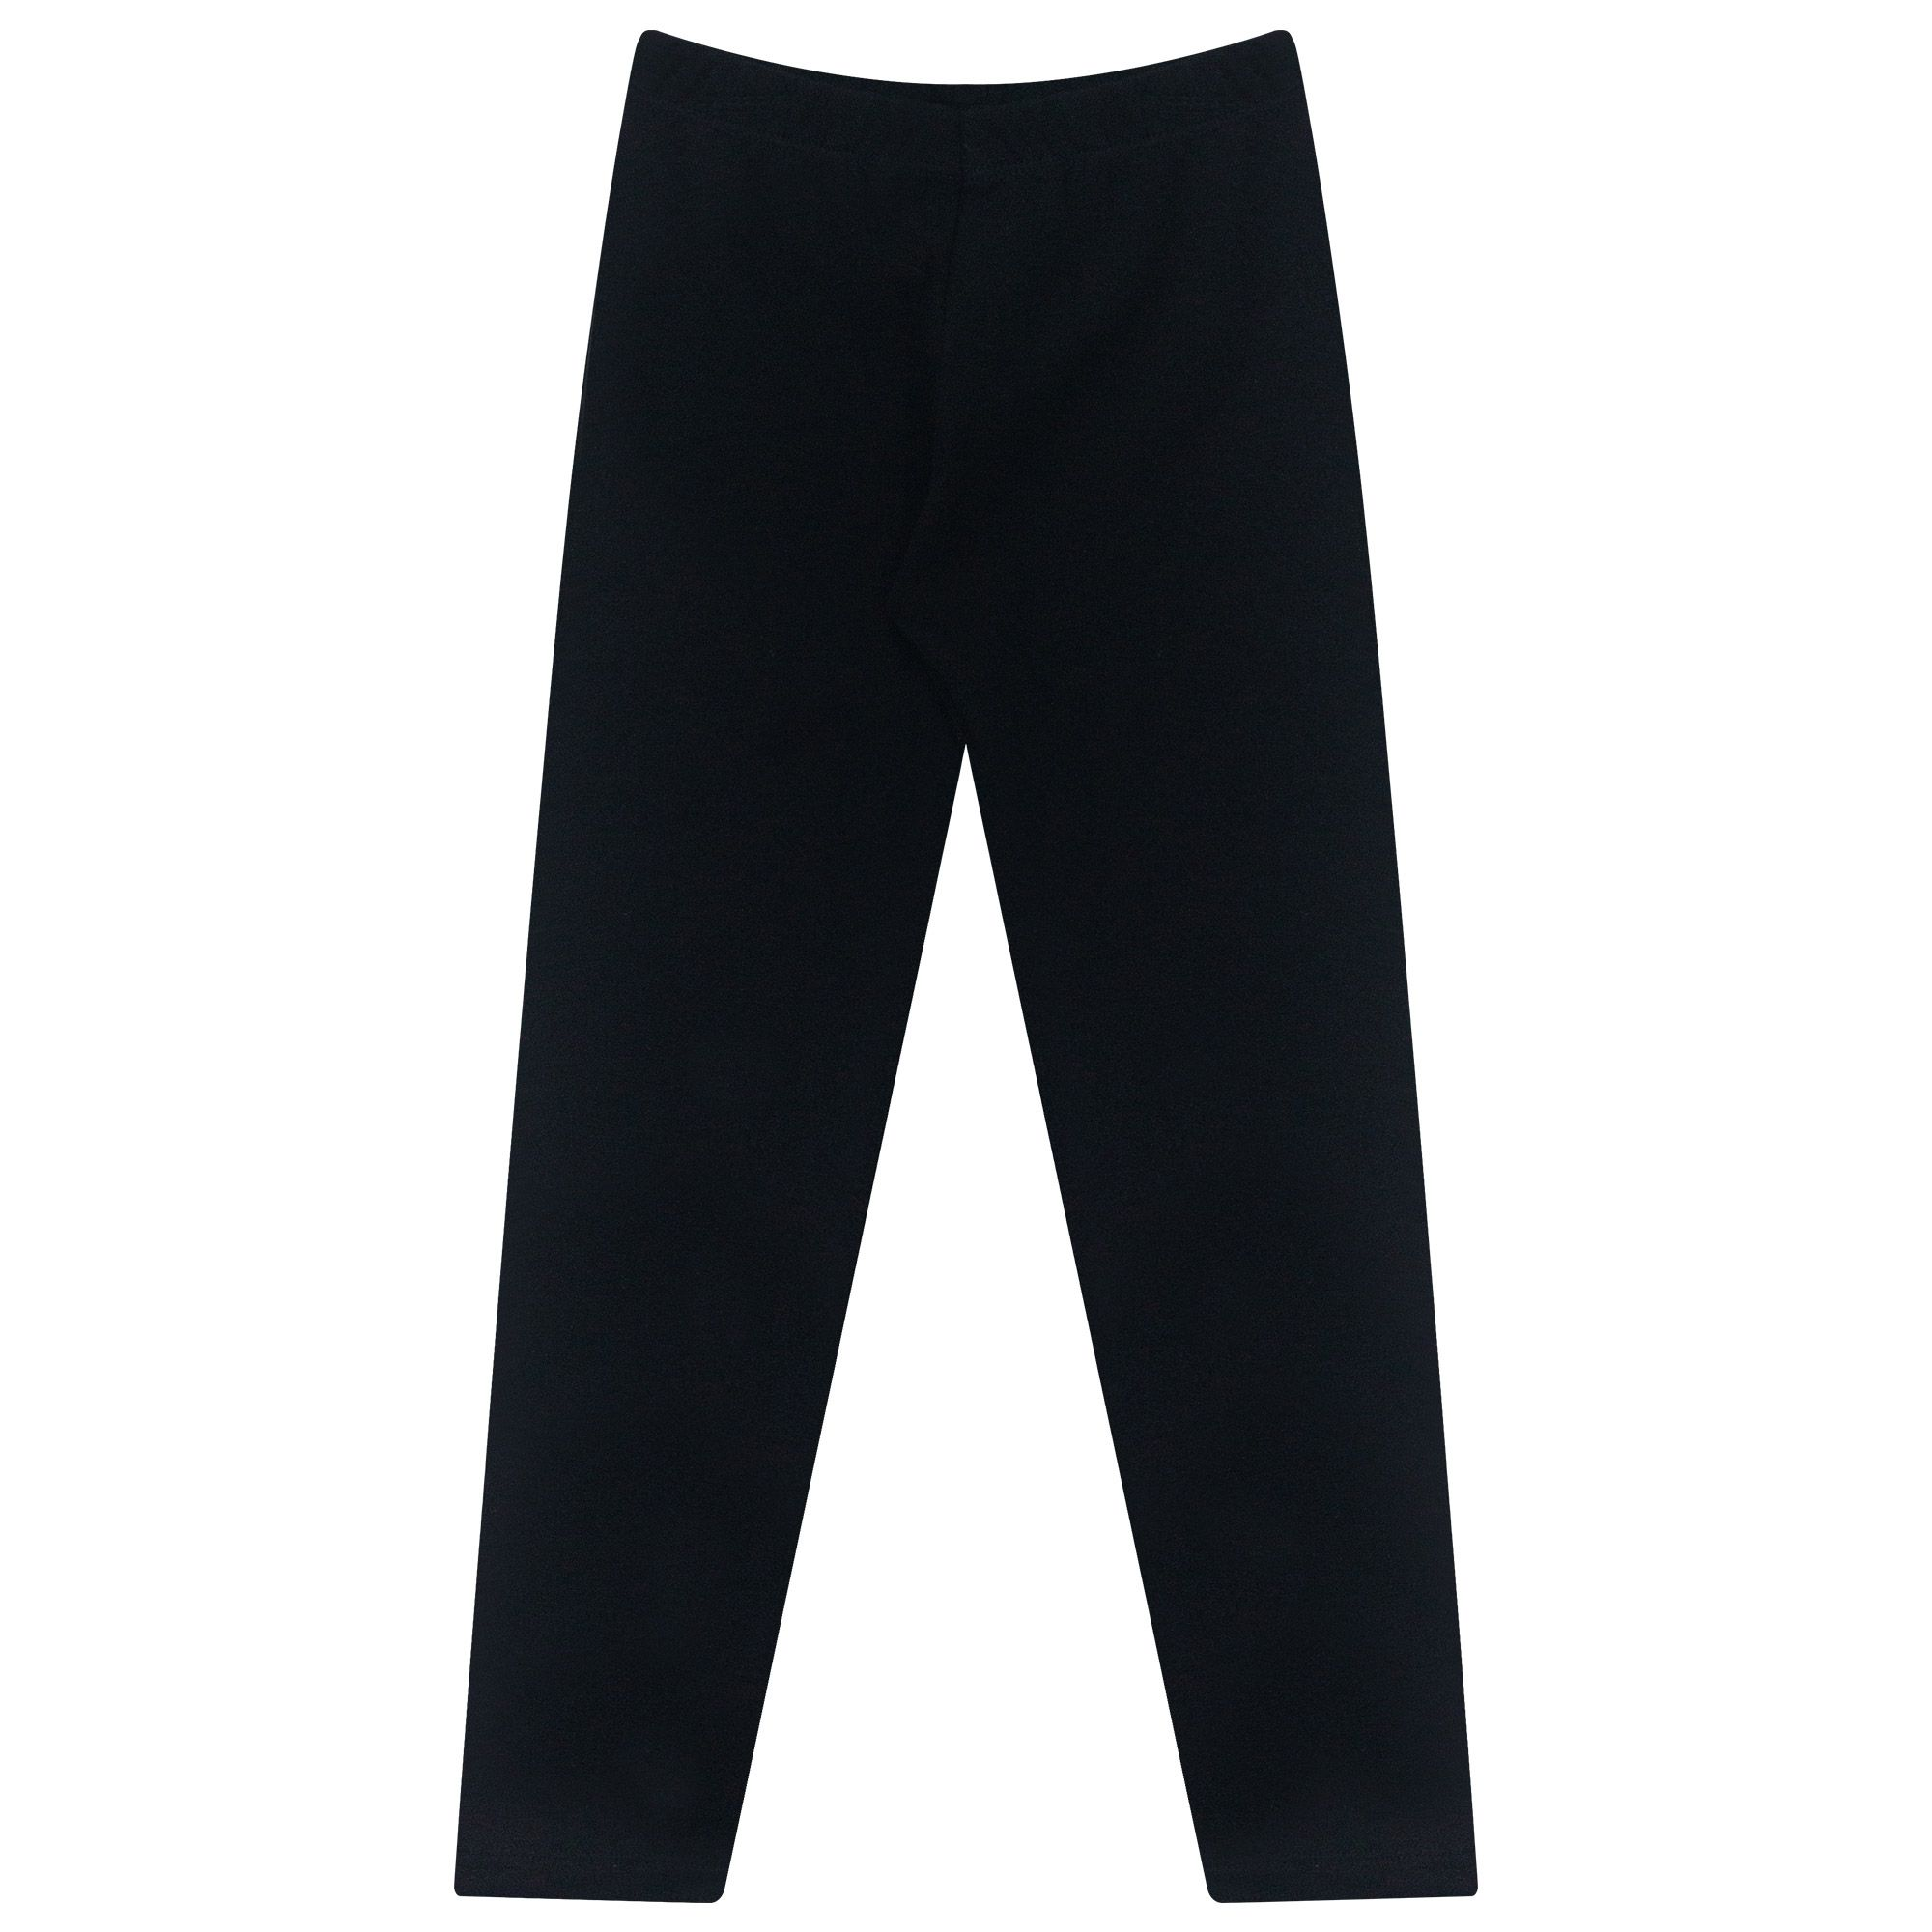 Calça Legging Infantil - Ref 4966 - Preto